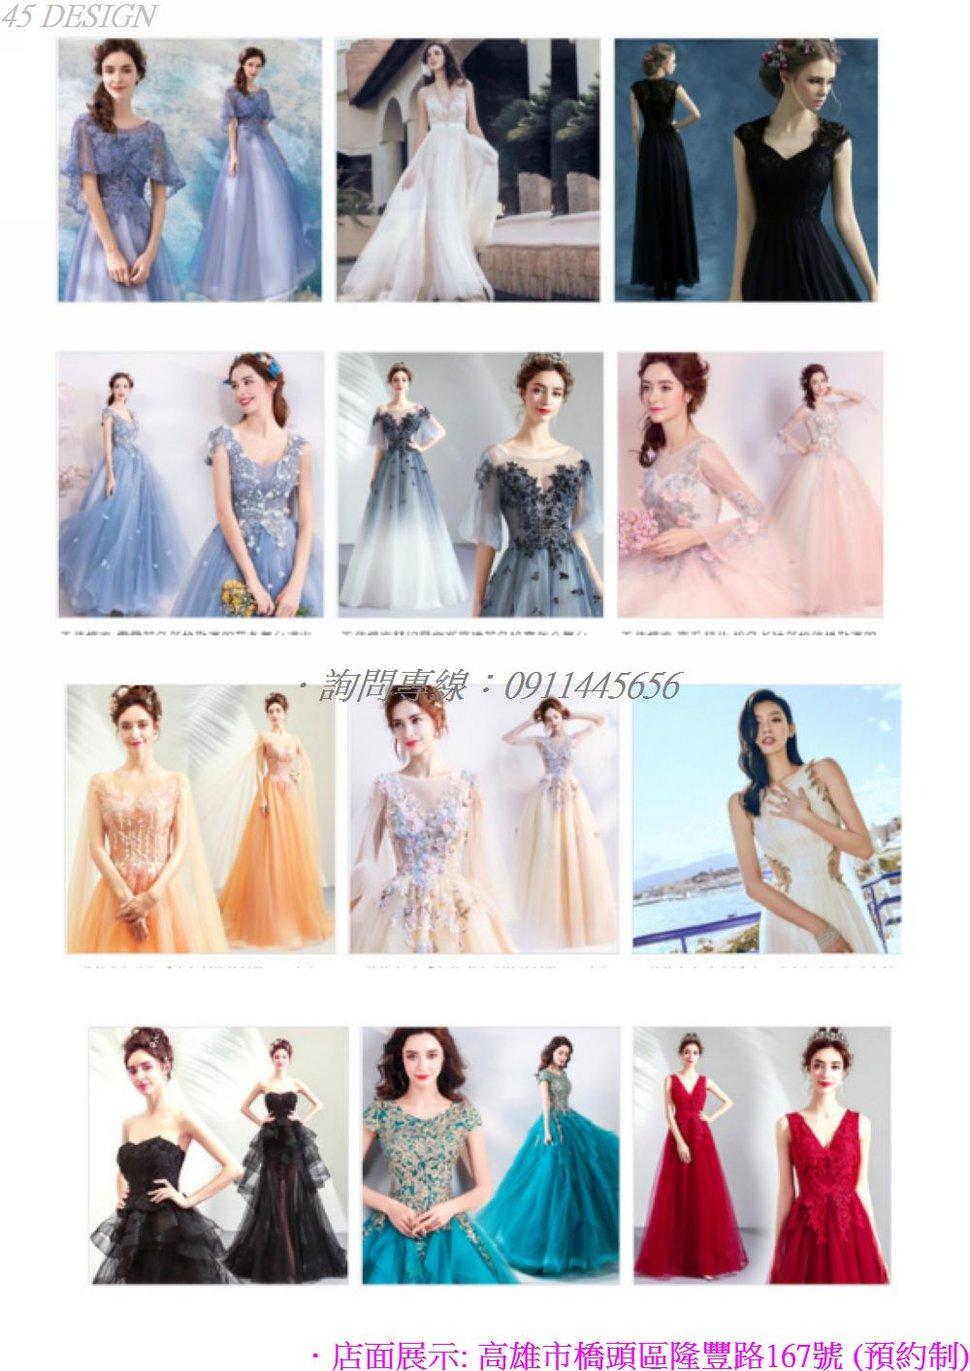 msl19081539396AC3CD2A46F5B2FE62051A8BCE25 - 全台最便宜-45DESIGN四五婚紗禮服《結婚吧》